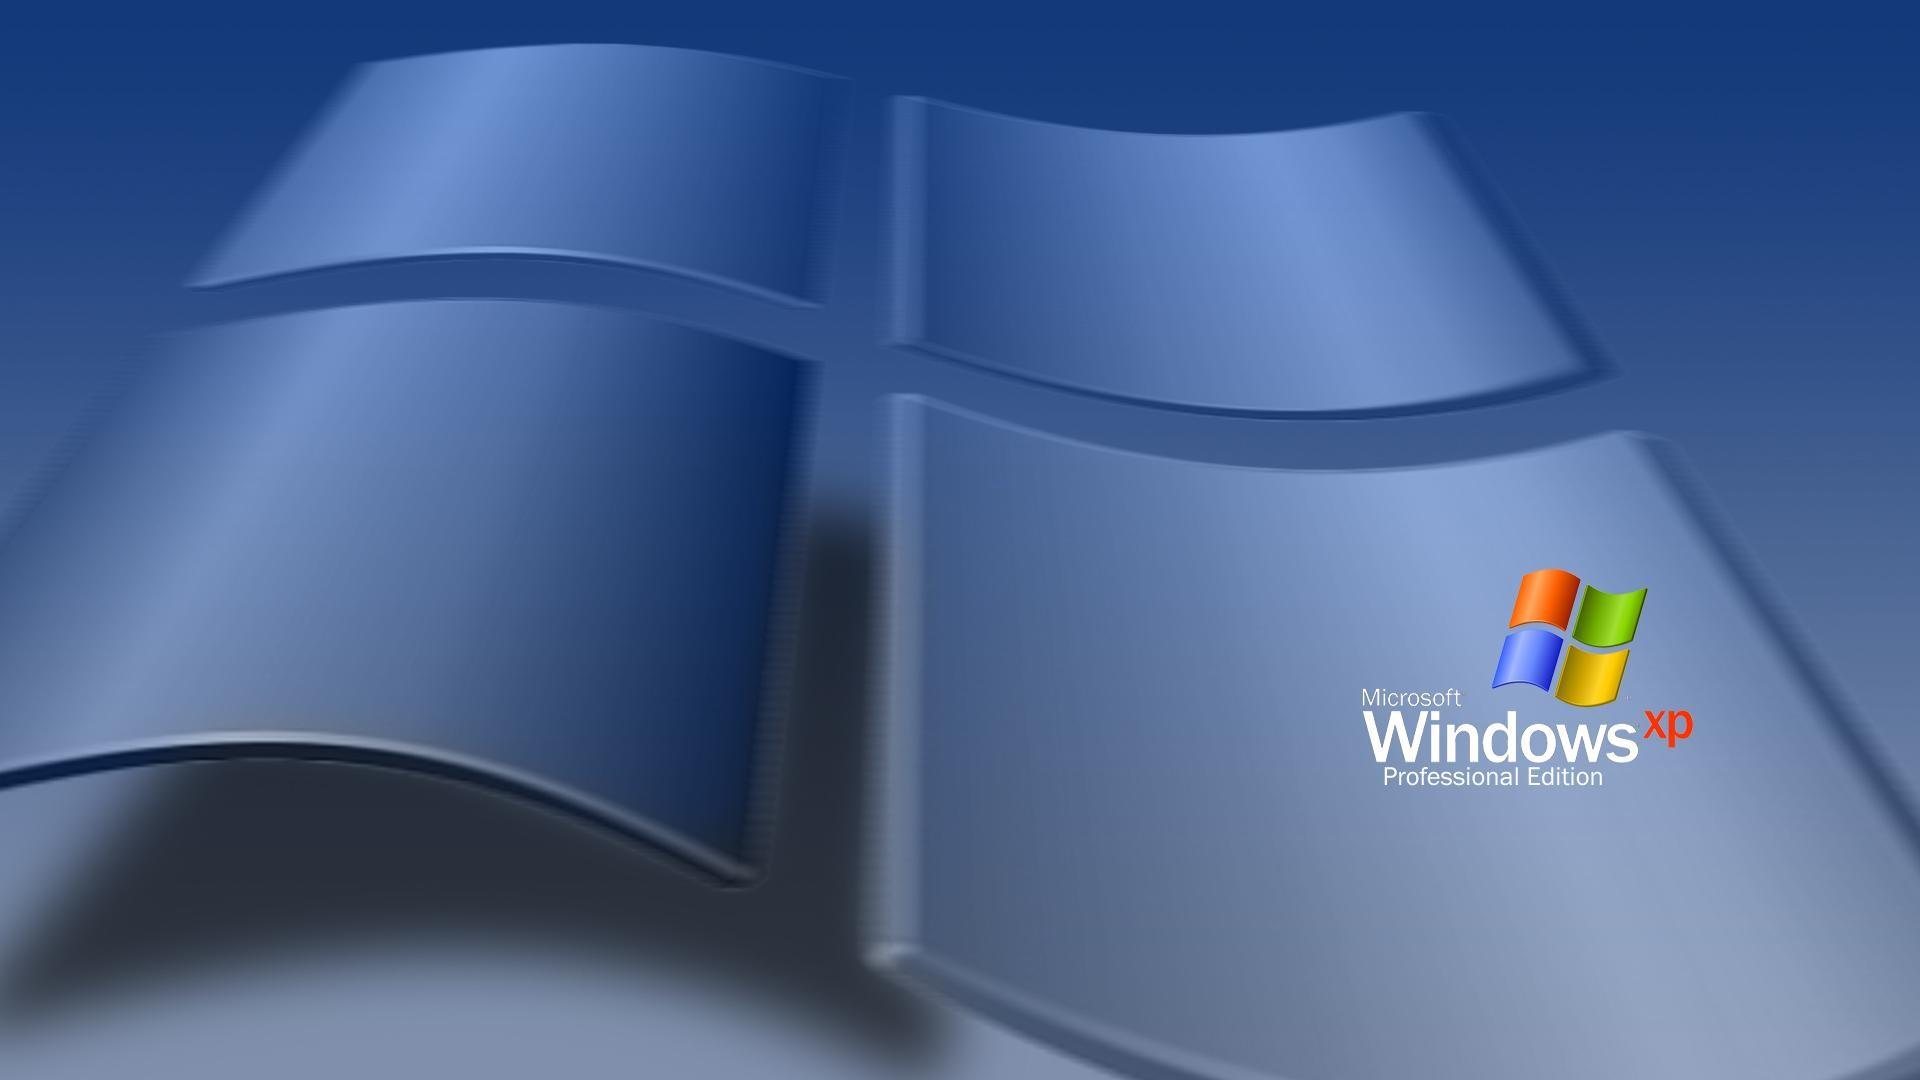 … Windows XP wallpapers 20 …